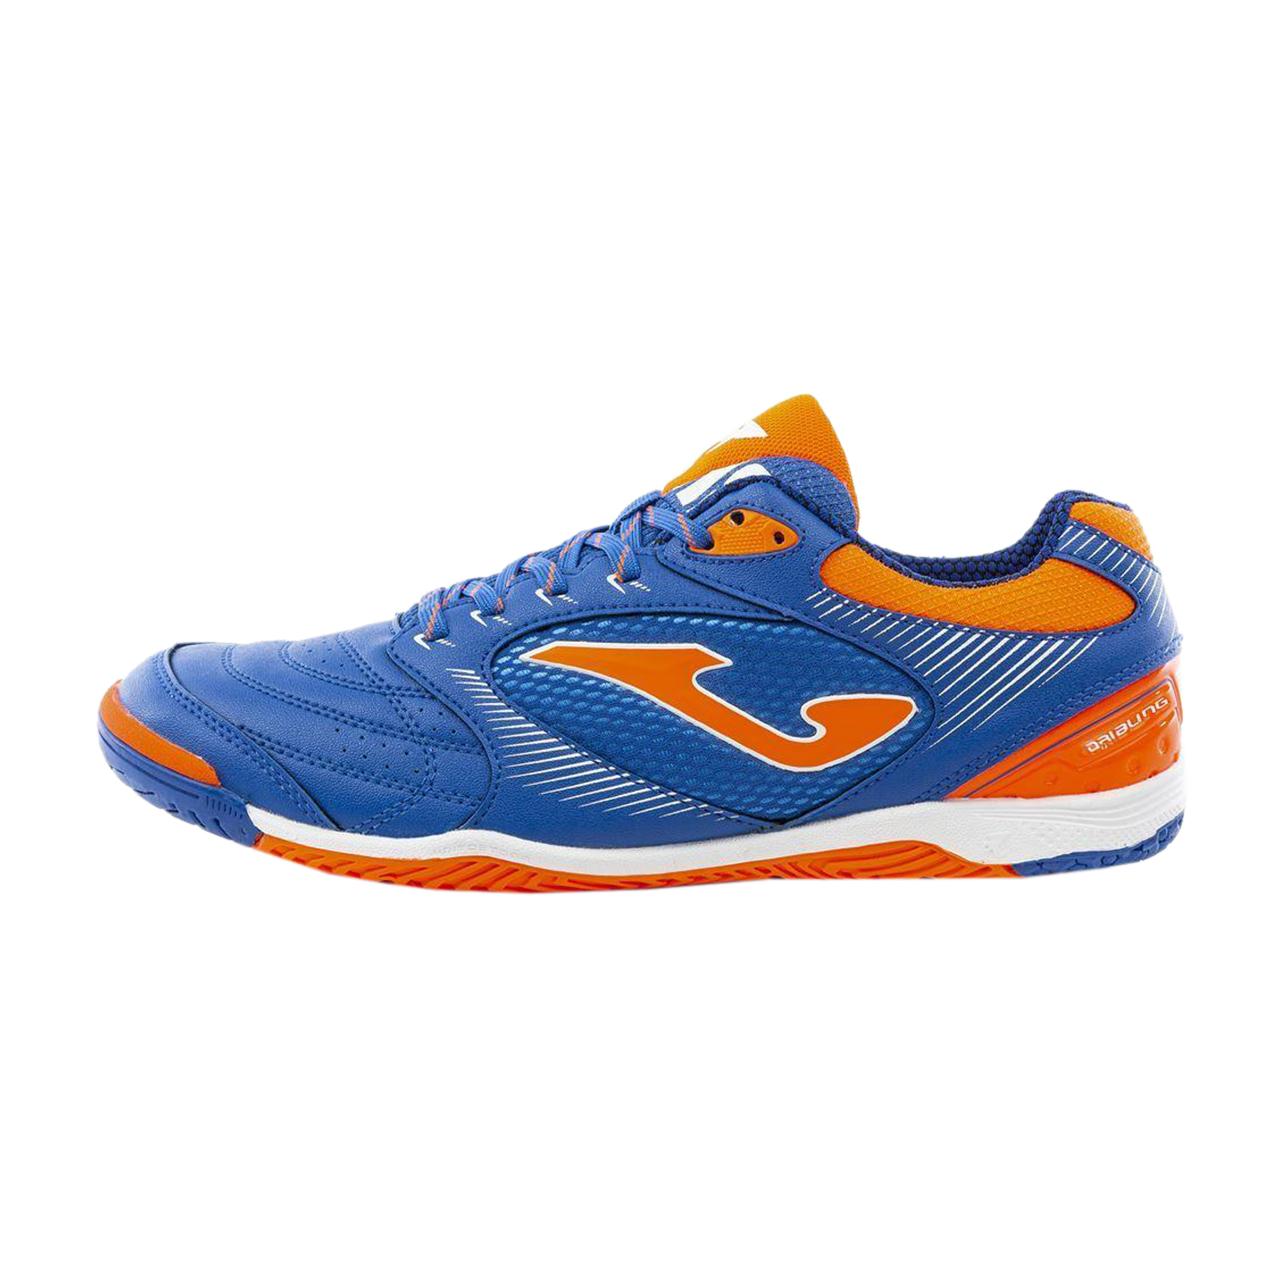 کفش فوتسال مردانه جوما مدل DRIBLING 904